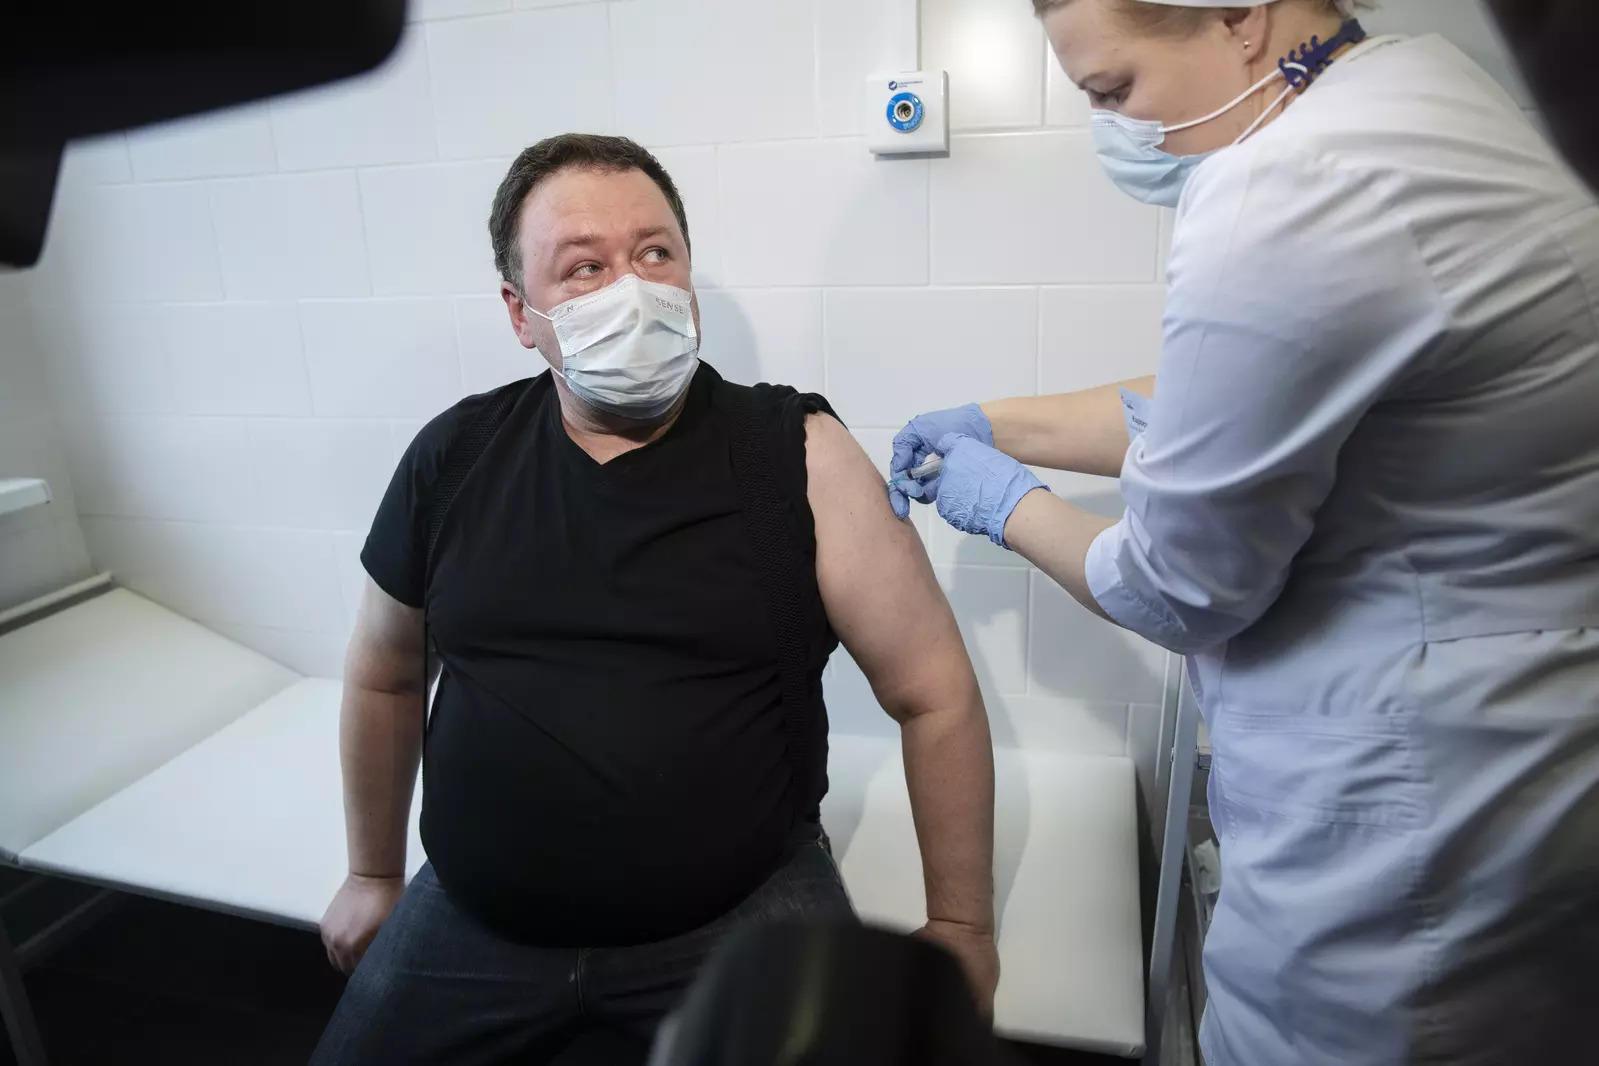 Single vaccine dose cuts Covid-19 transmission by half: UK study